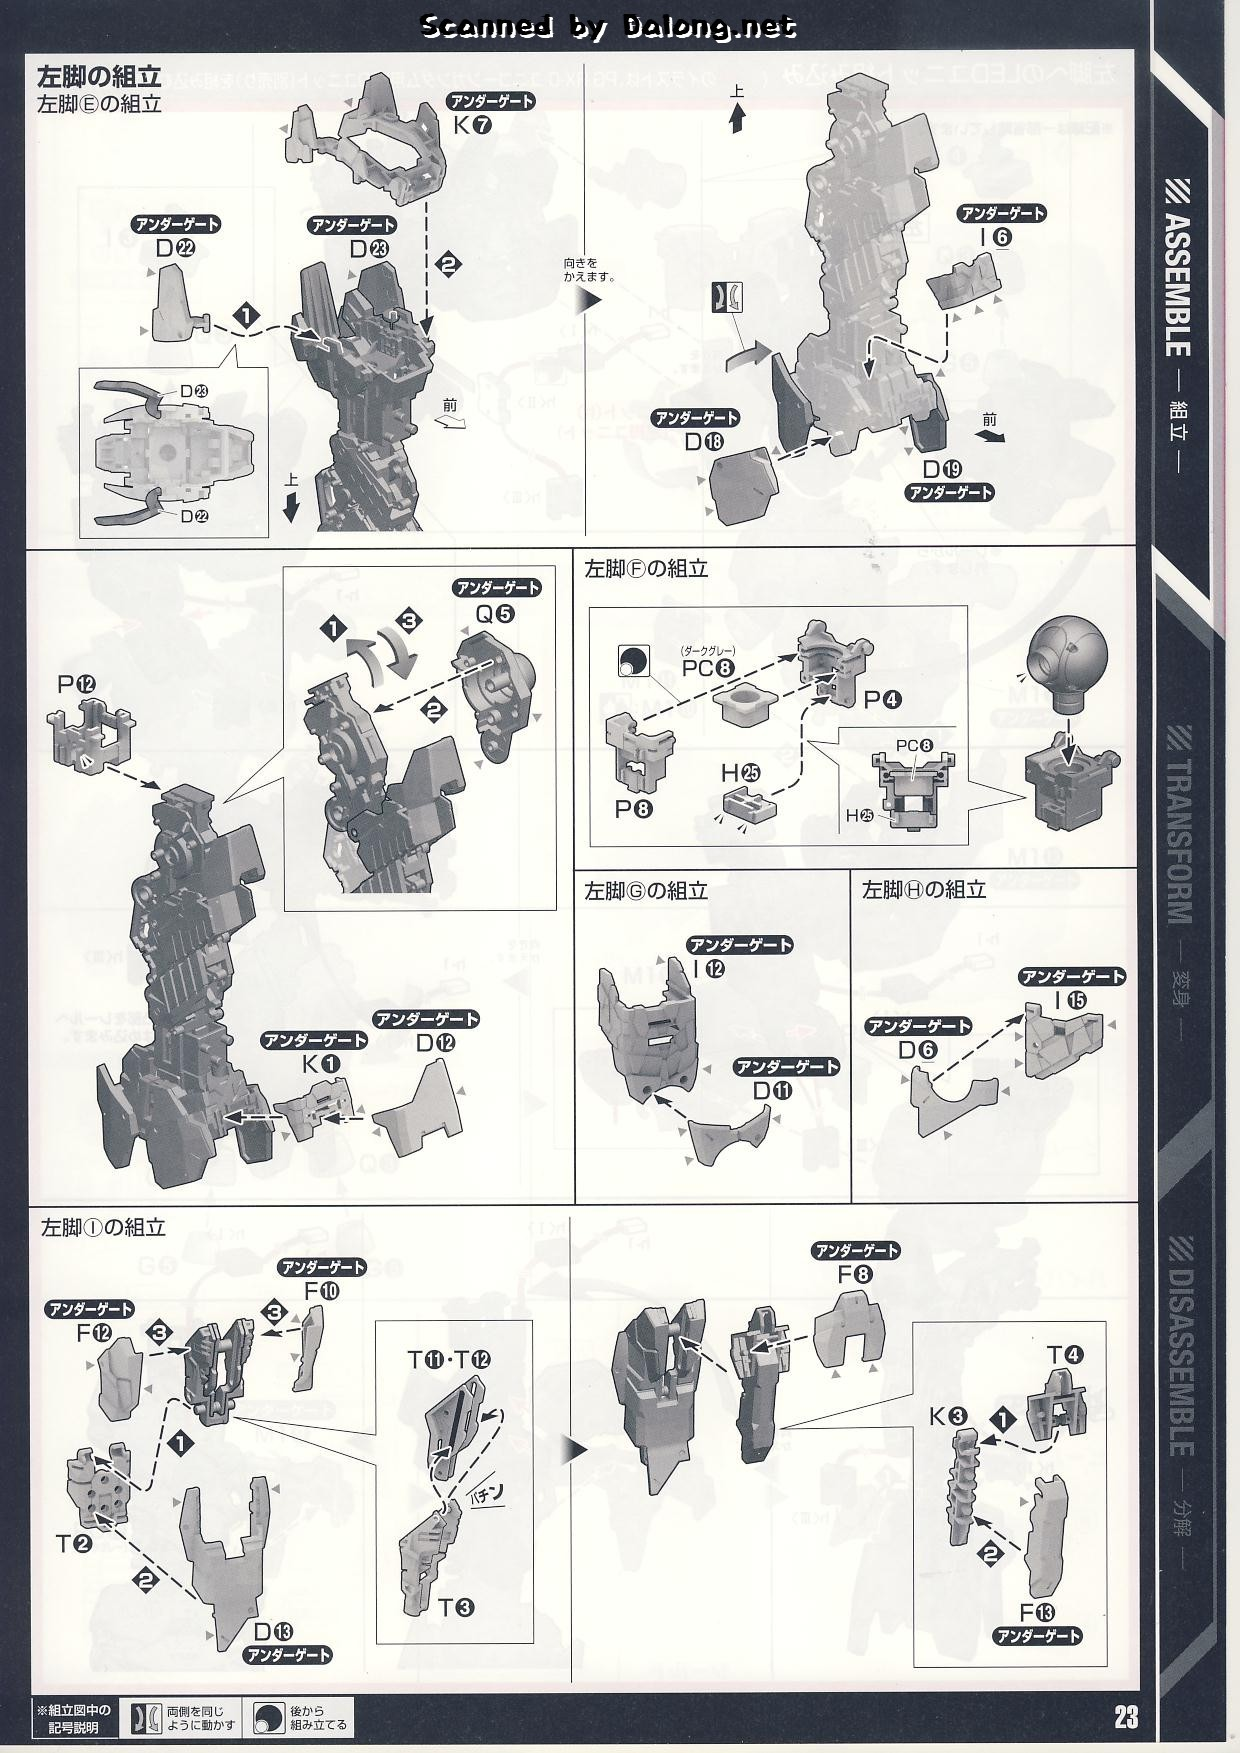 PG15独角兽高达说明23.JPG